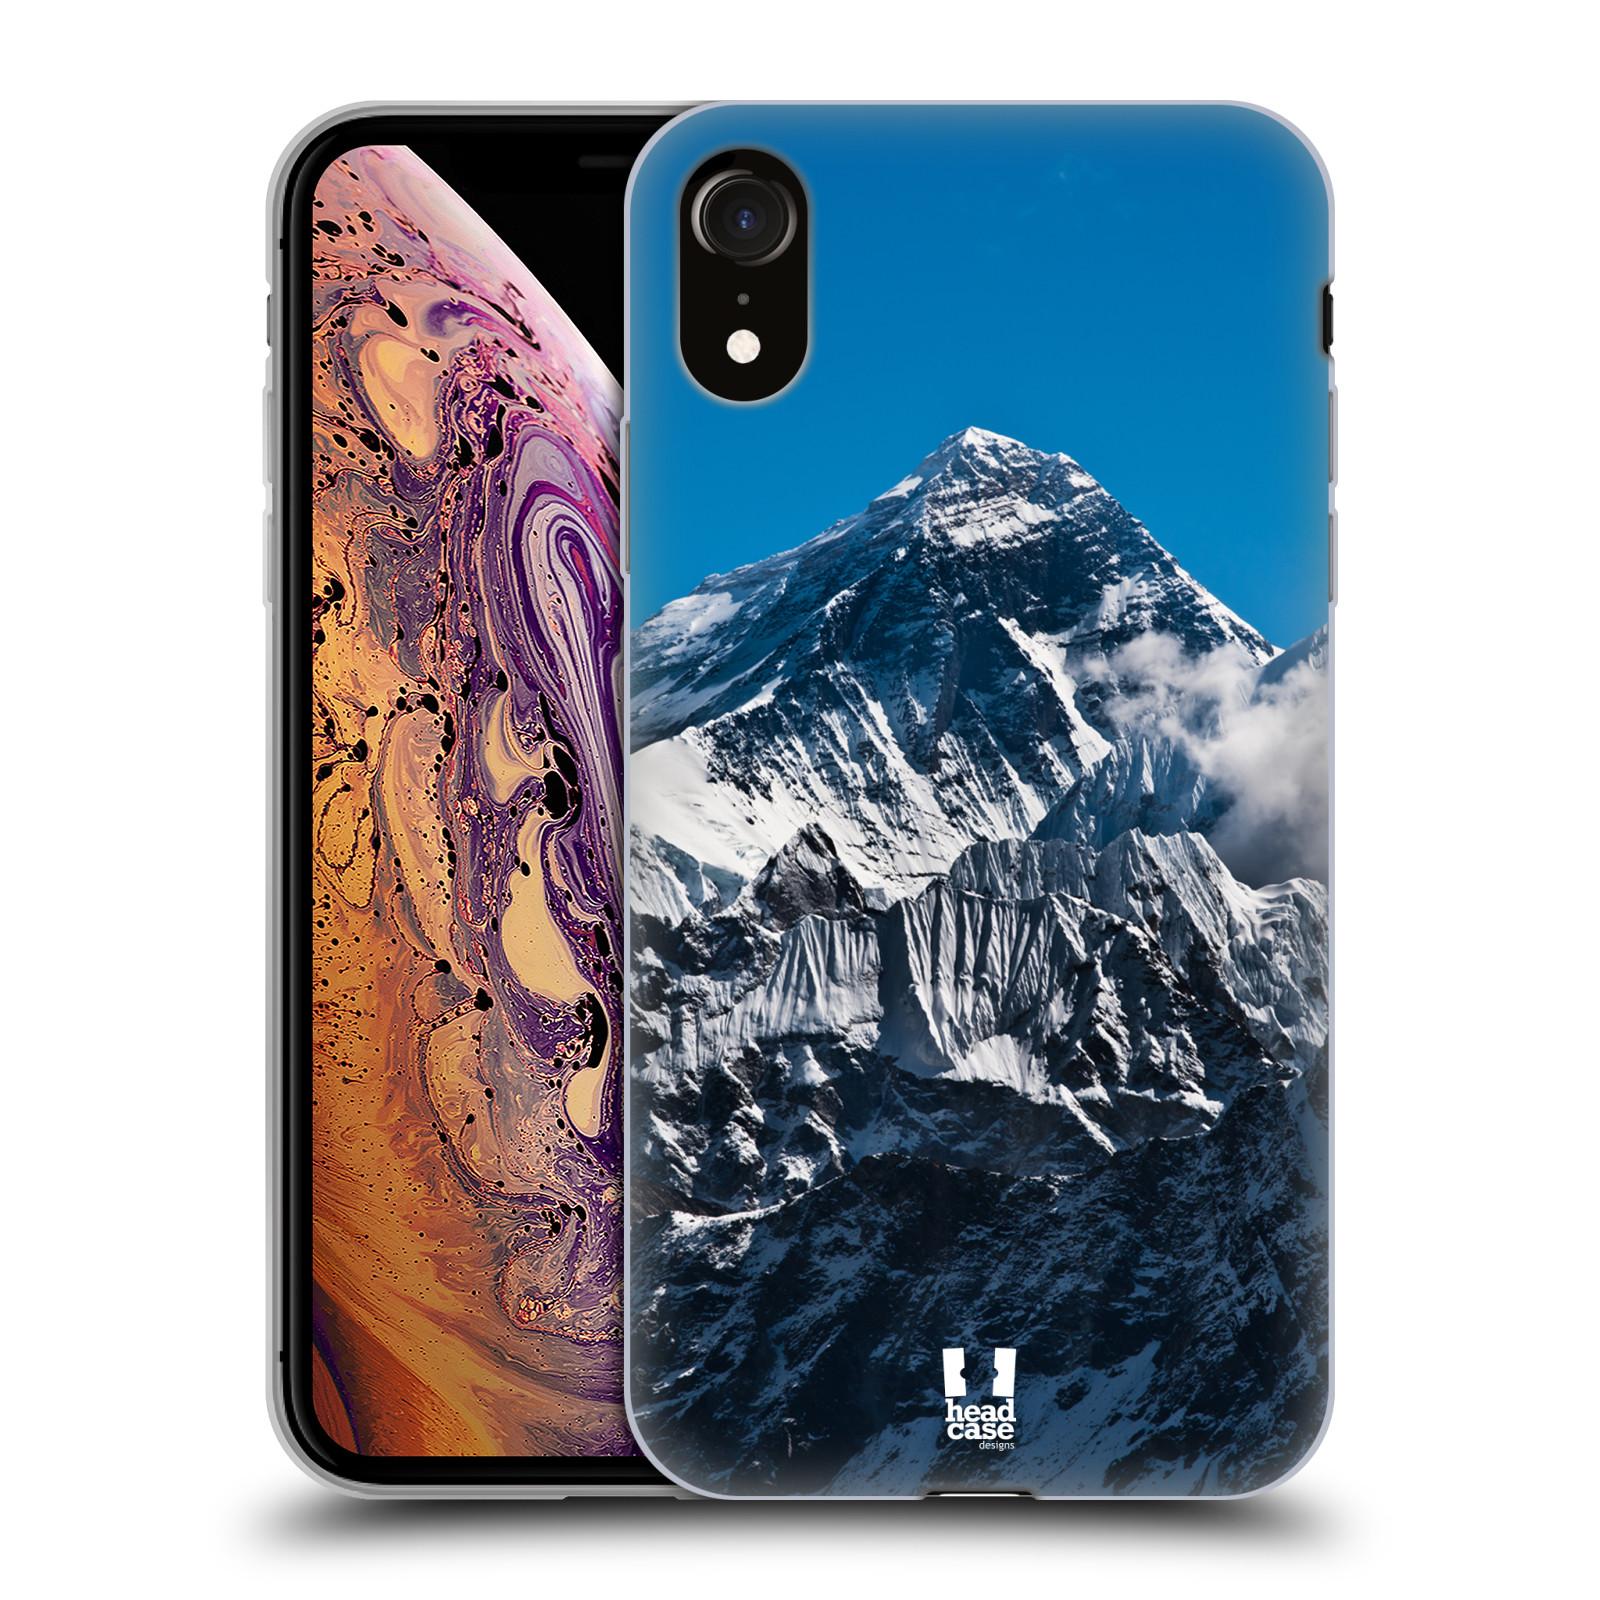 Silikonové pouzdro na mobil Apple iPhone XR - Head Case - Mount Everest Peak f53accd937d